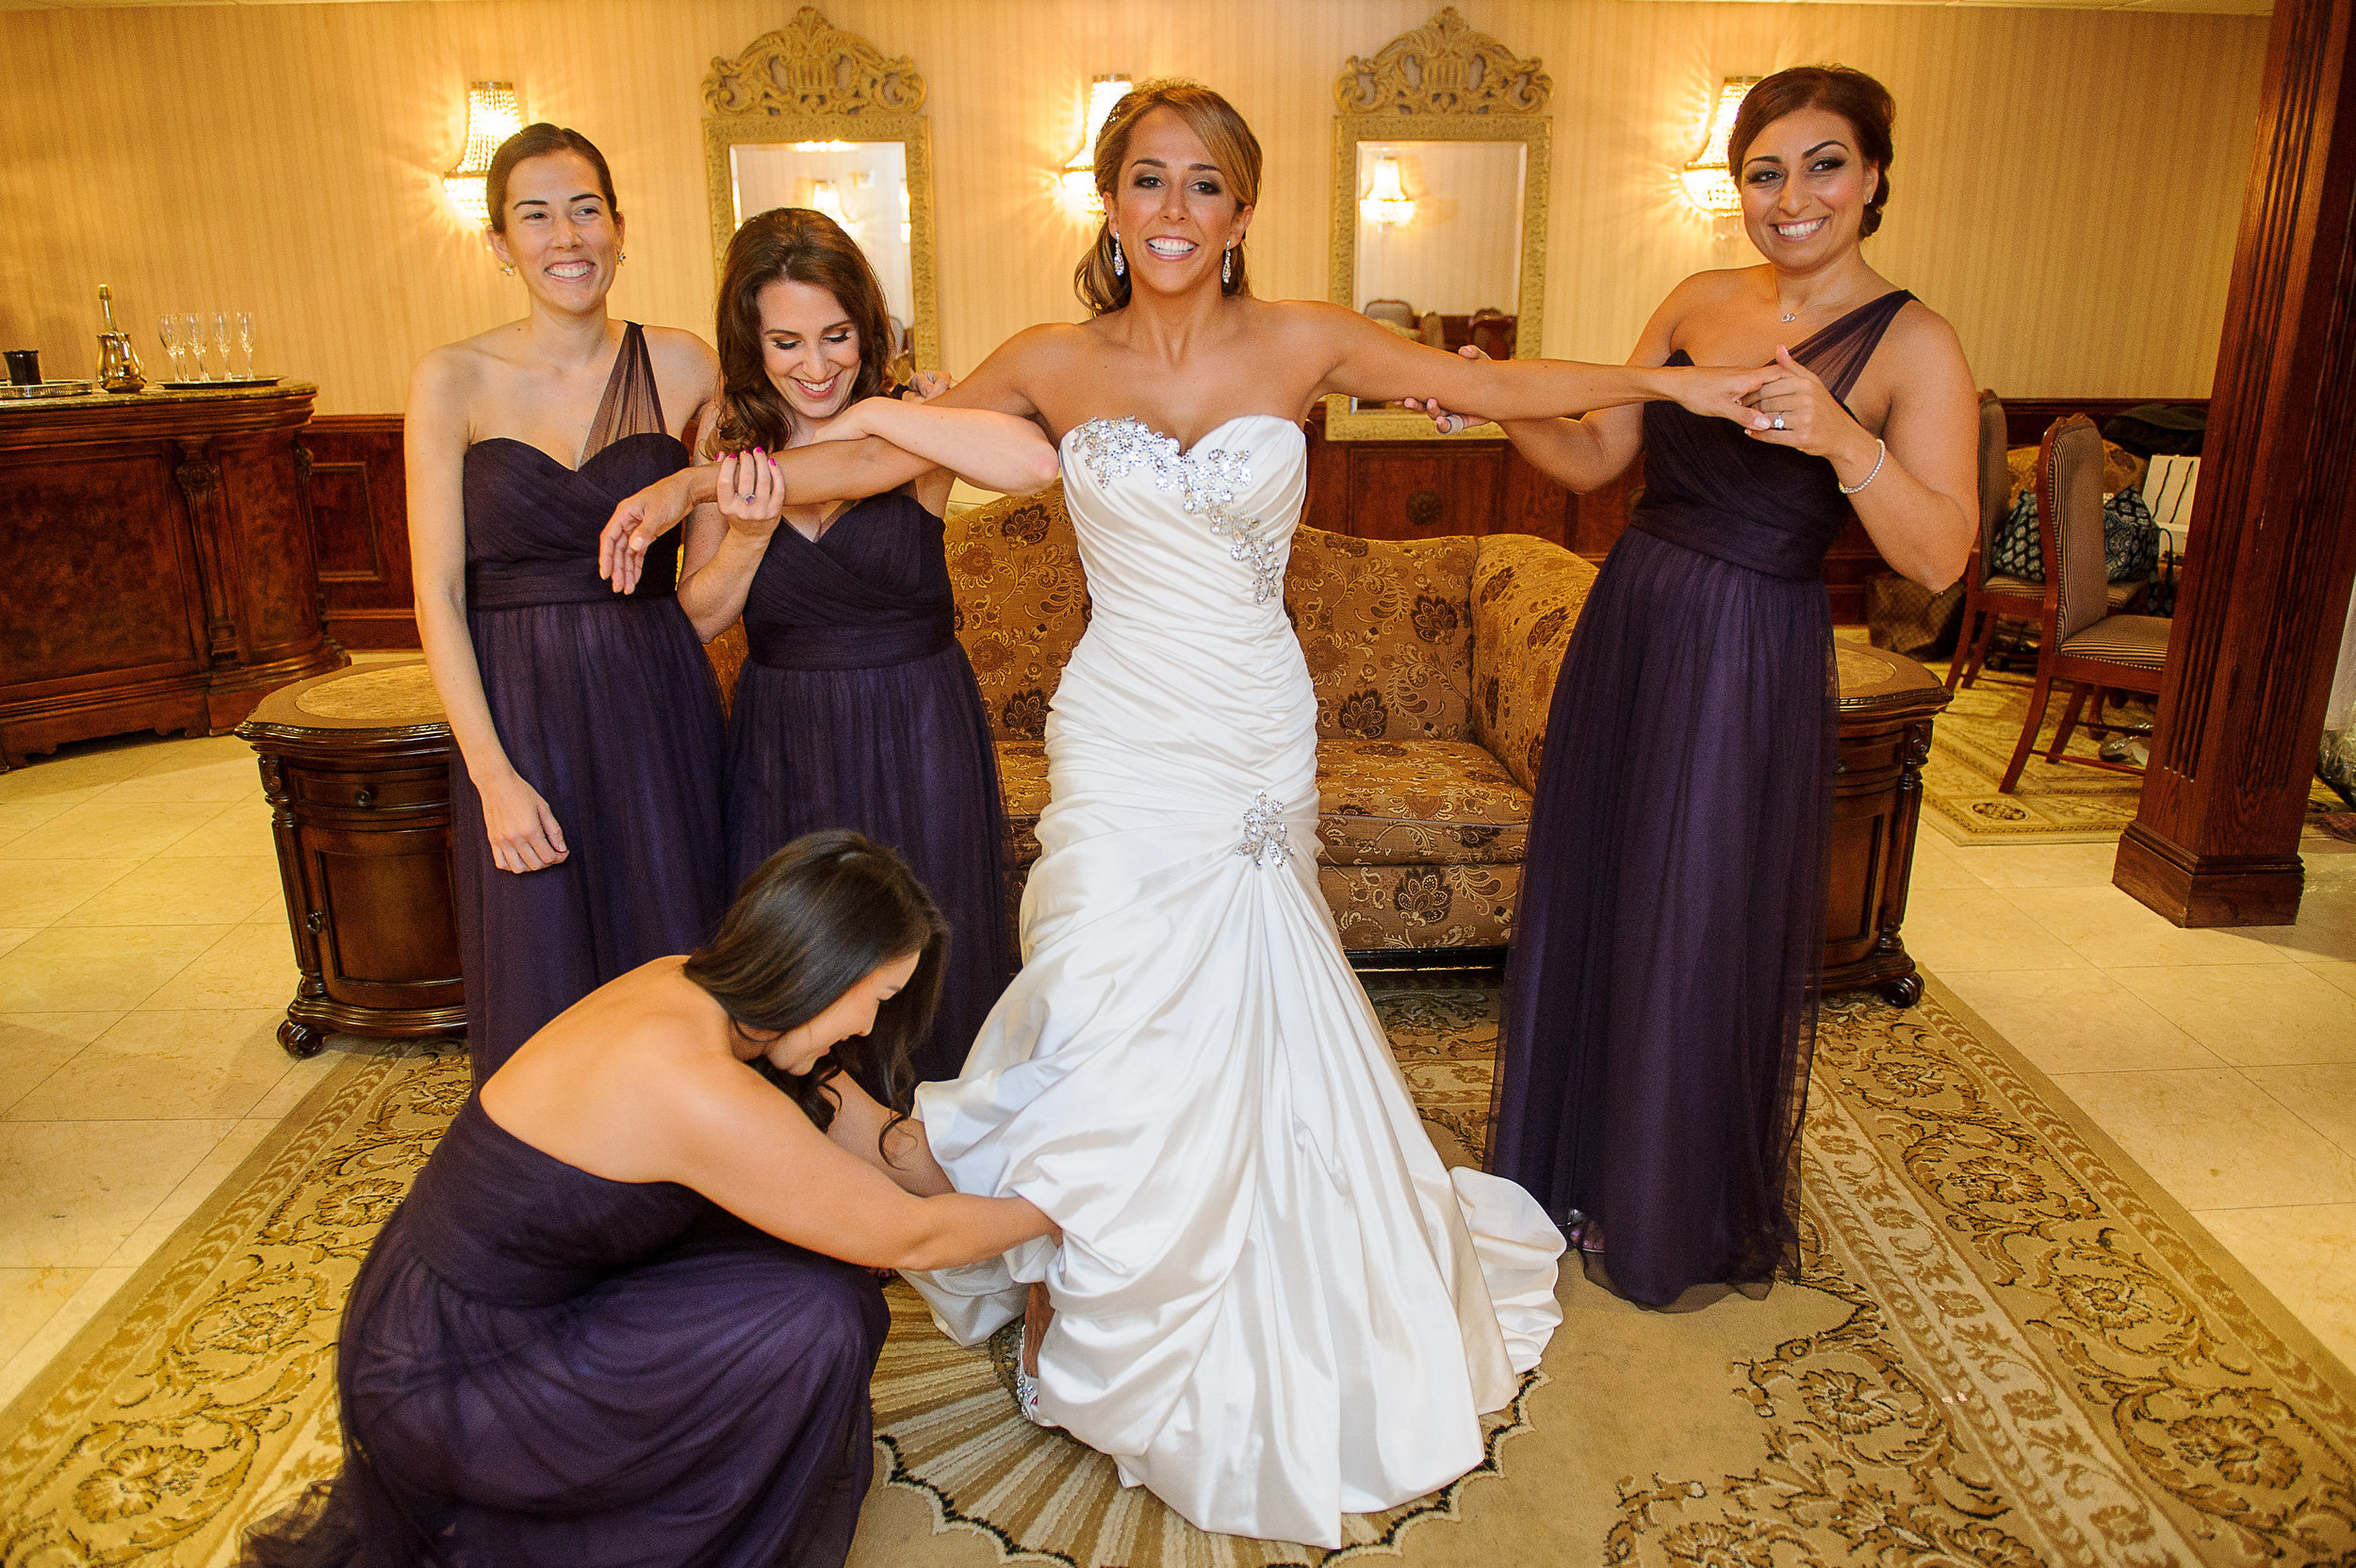 Ceci_New_York_Custom_Invitation_ New_Jersey_Wedding_Luxury_Personalized_Ceci_Style_Bride_Foil_Stamping82.JPG